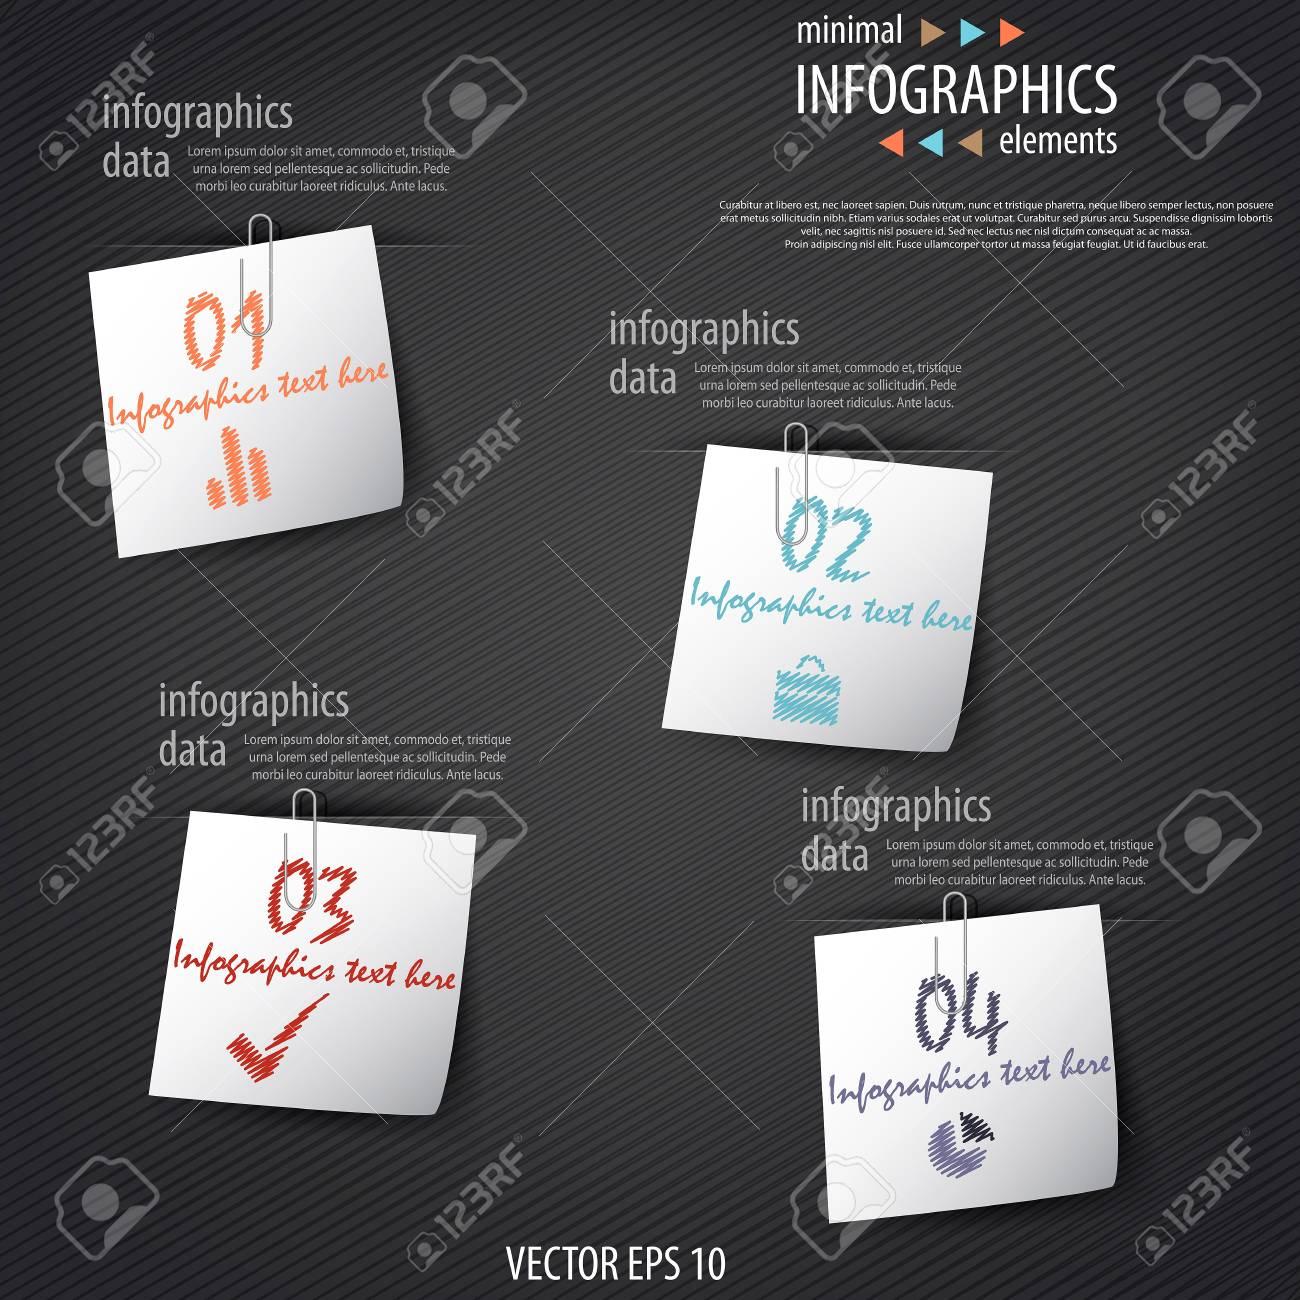 Minimal infographics. Stock Vector - 17920274